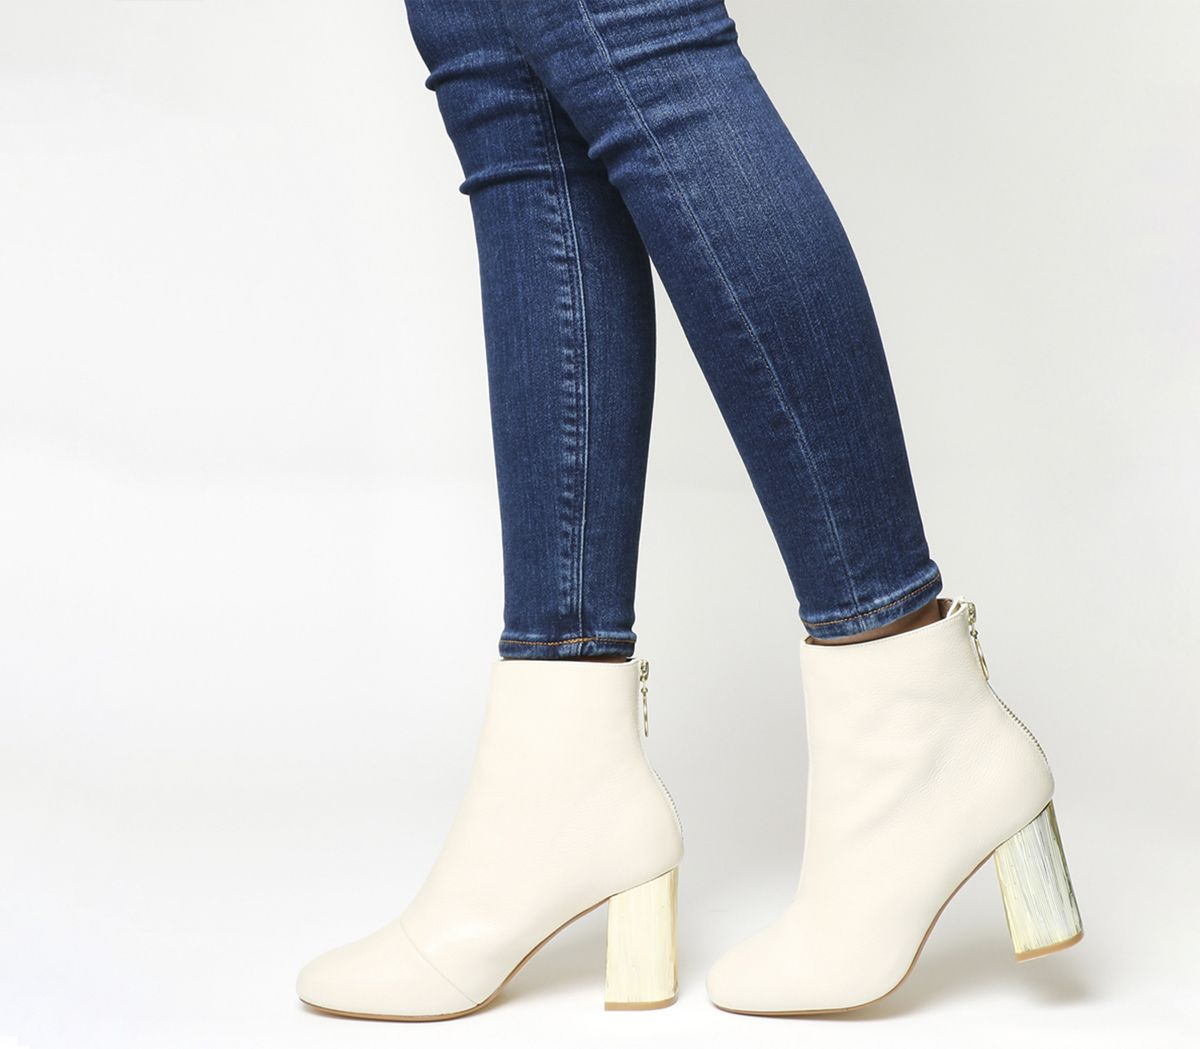 f1381ef56eca Office Alaska Block Heel Ankle Boots Off White Leather Gold Heel ...